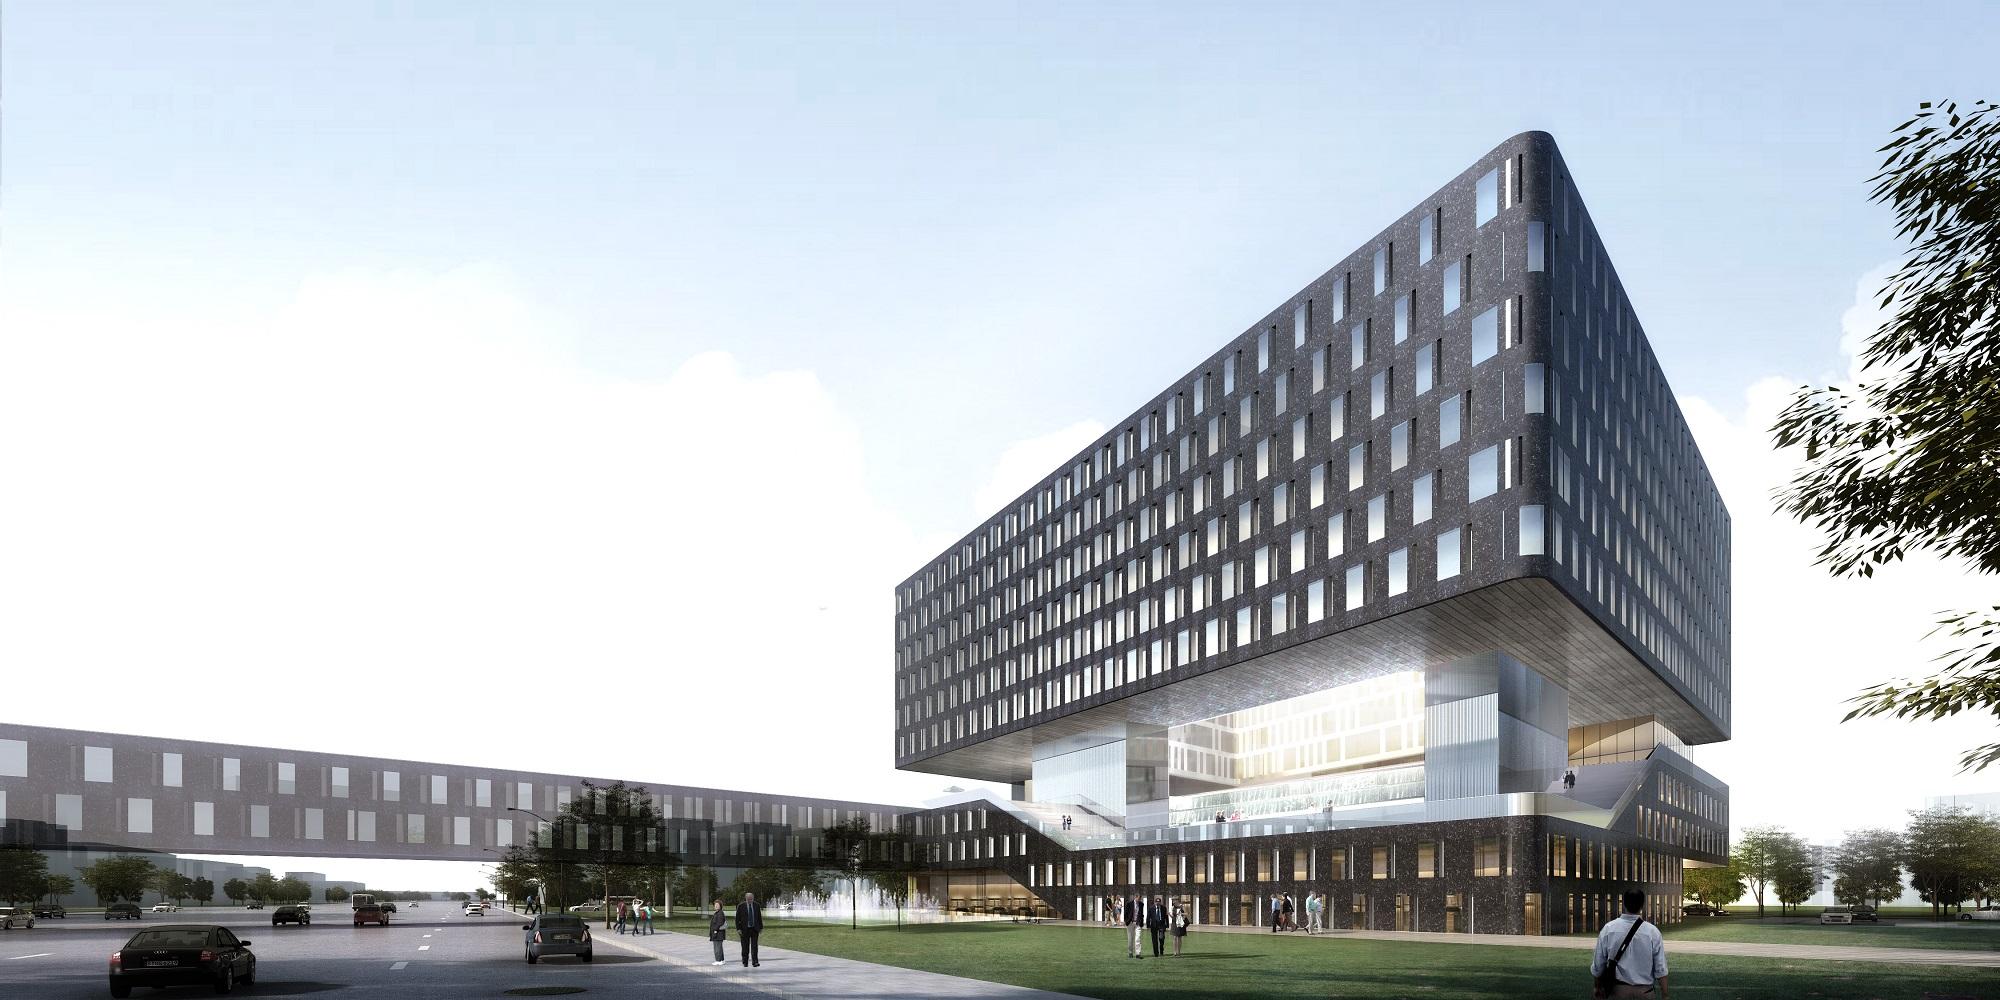 Linkong 16 1 Novotel Hotel Architect Magazine Aedas